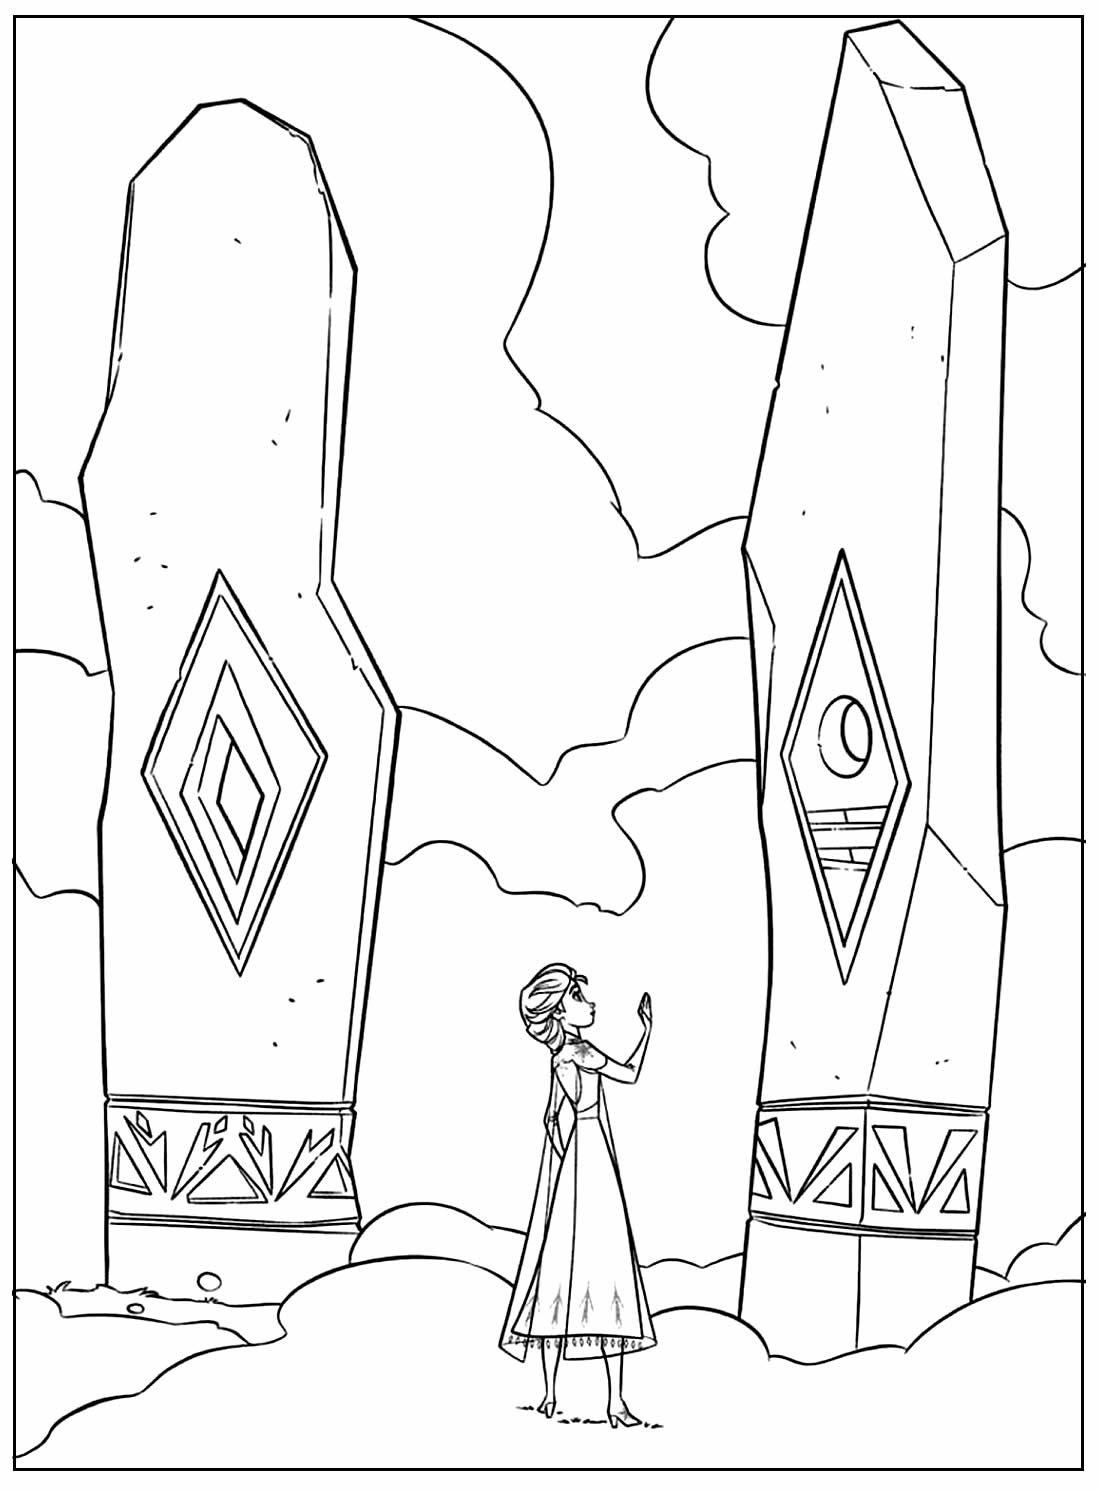 Desenho para pintar e colorir da Princesa Elsa